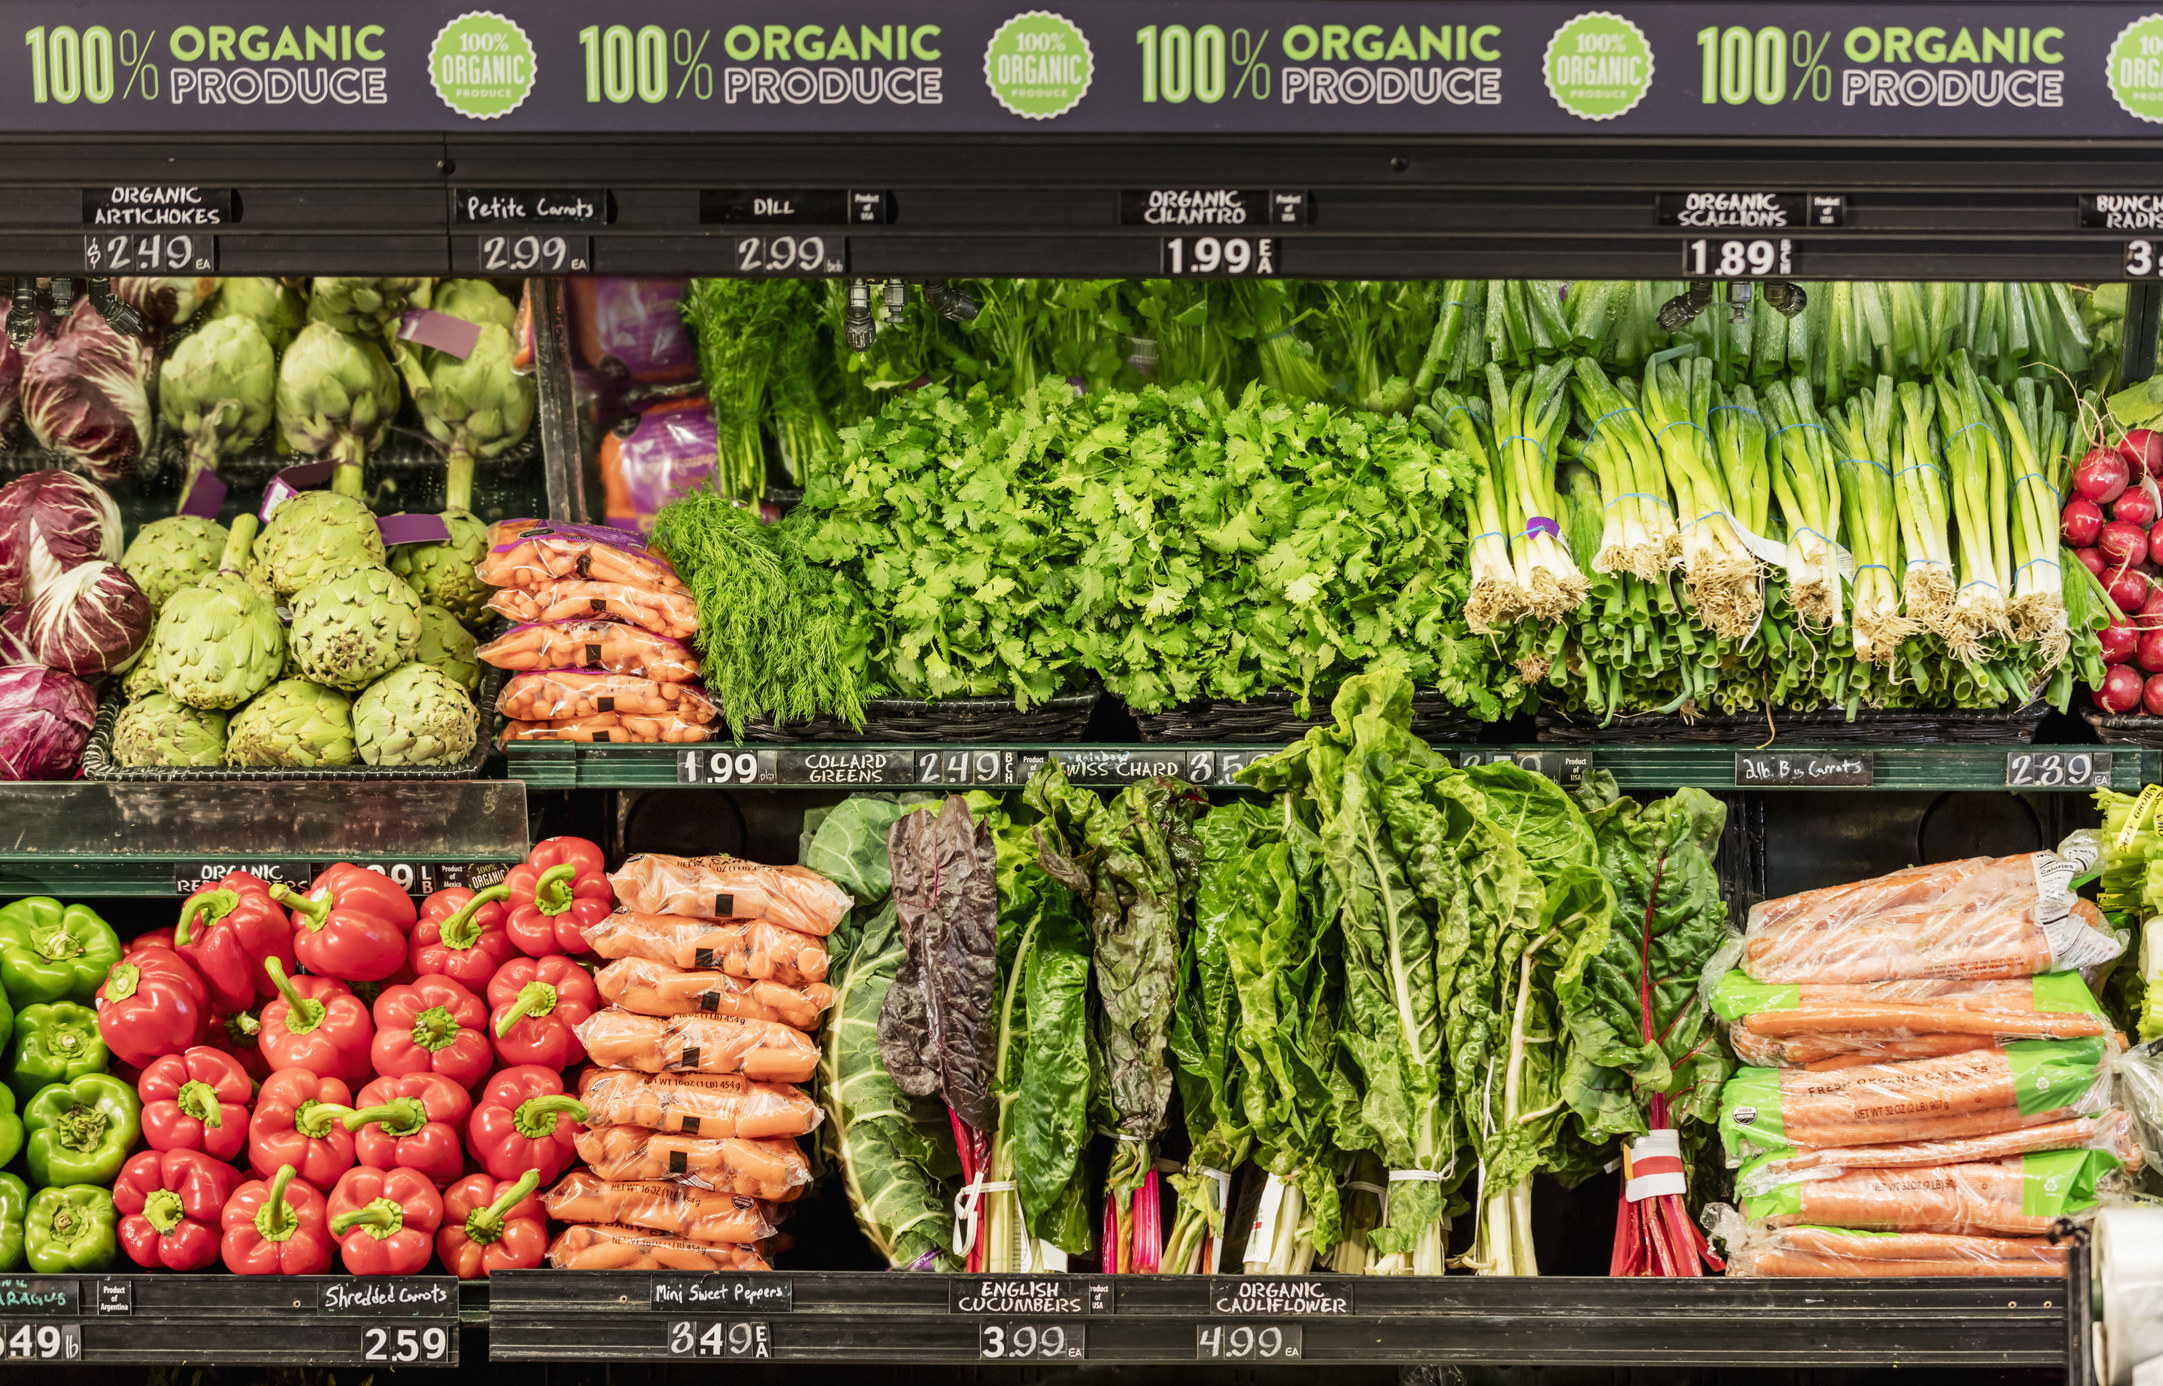 The produce aisle at a market.